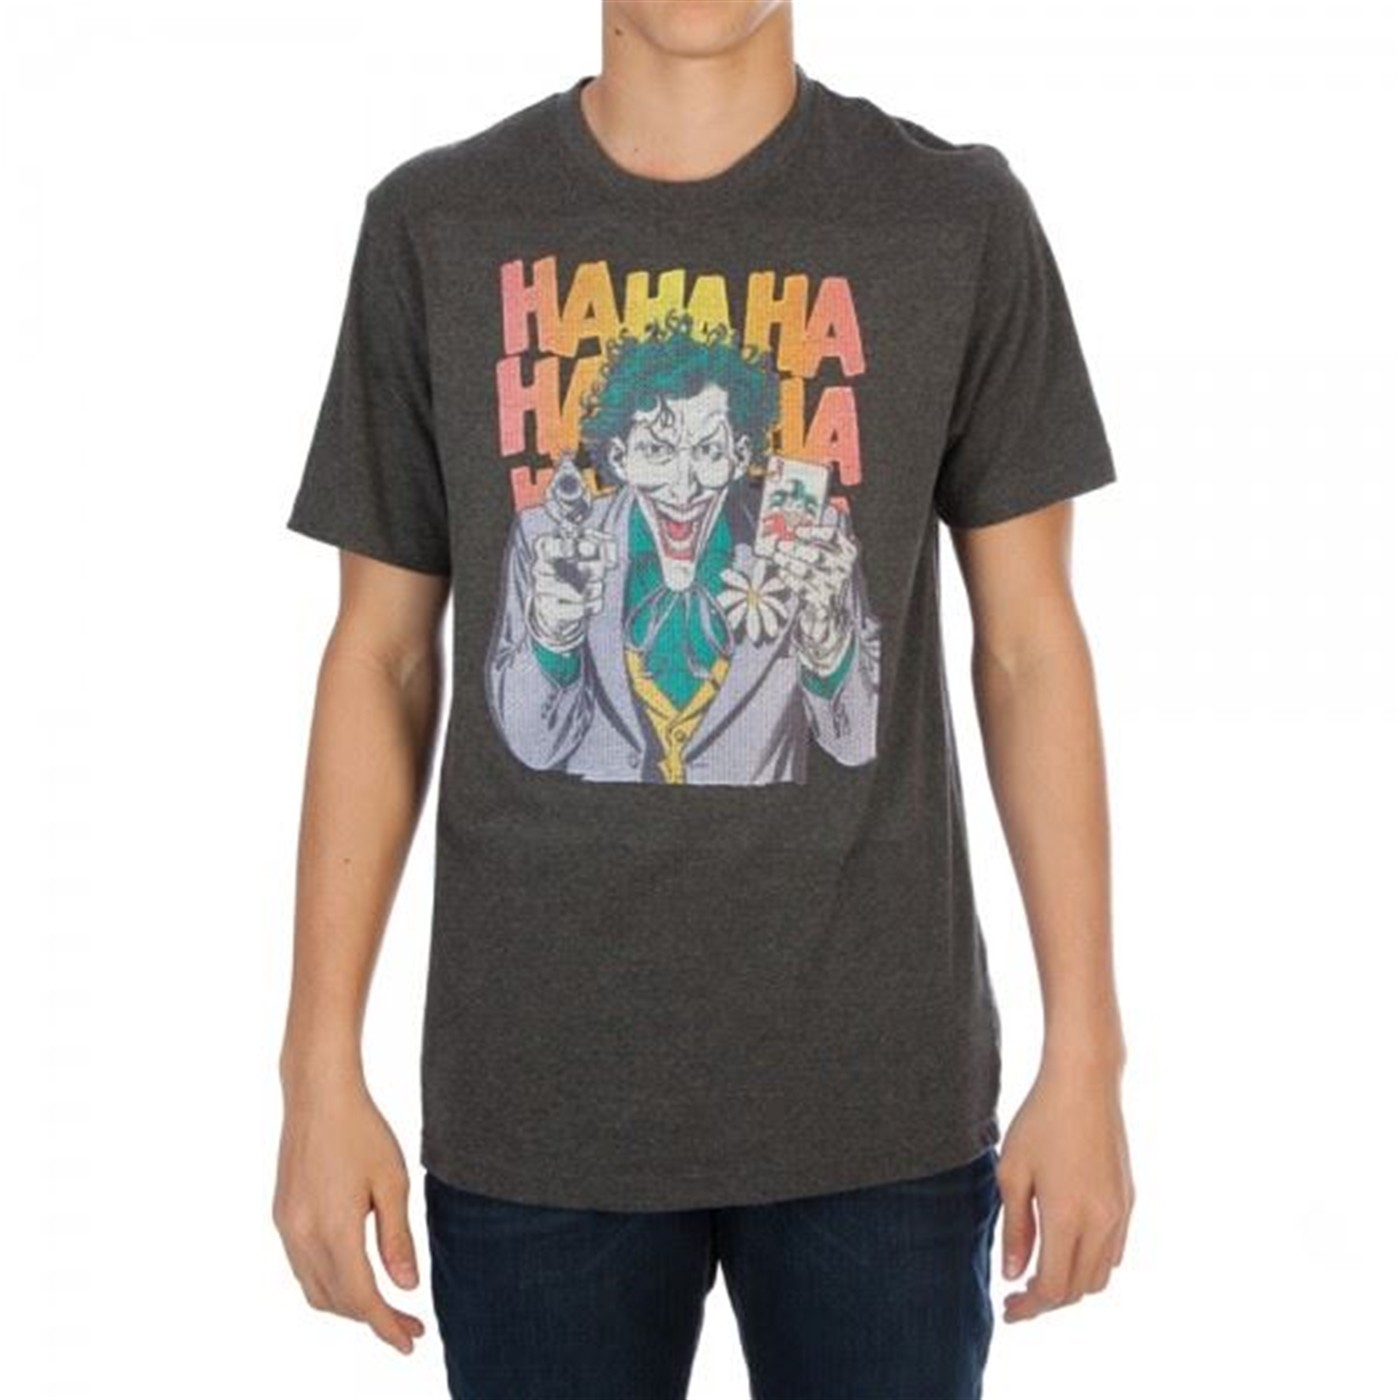 DC Comics Joker HAHAHA Threadpixel Mens T-Shirt